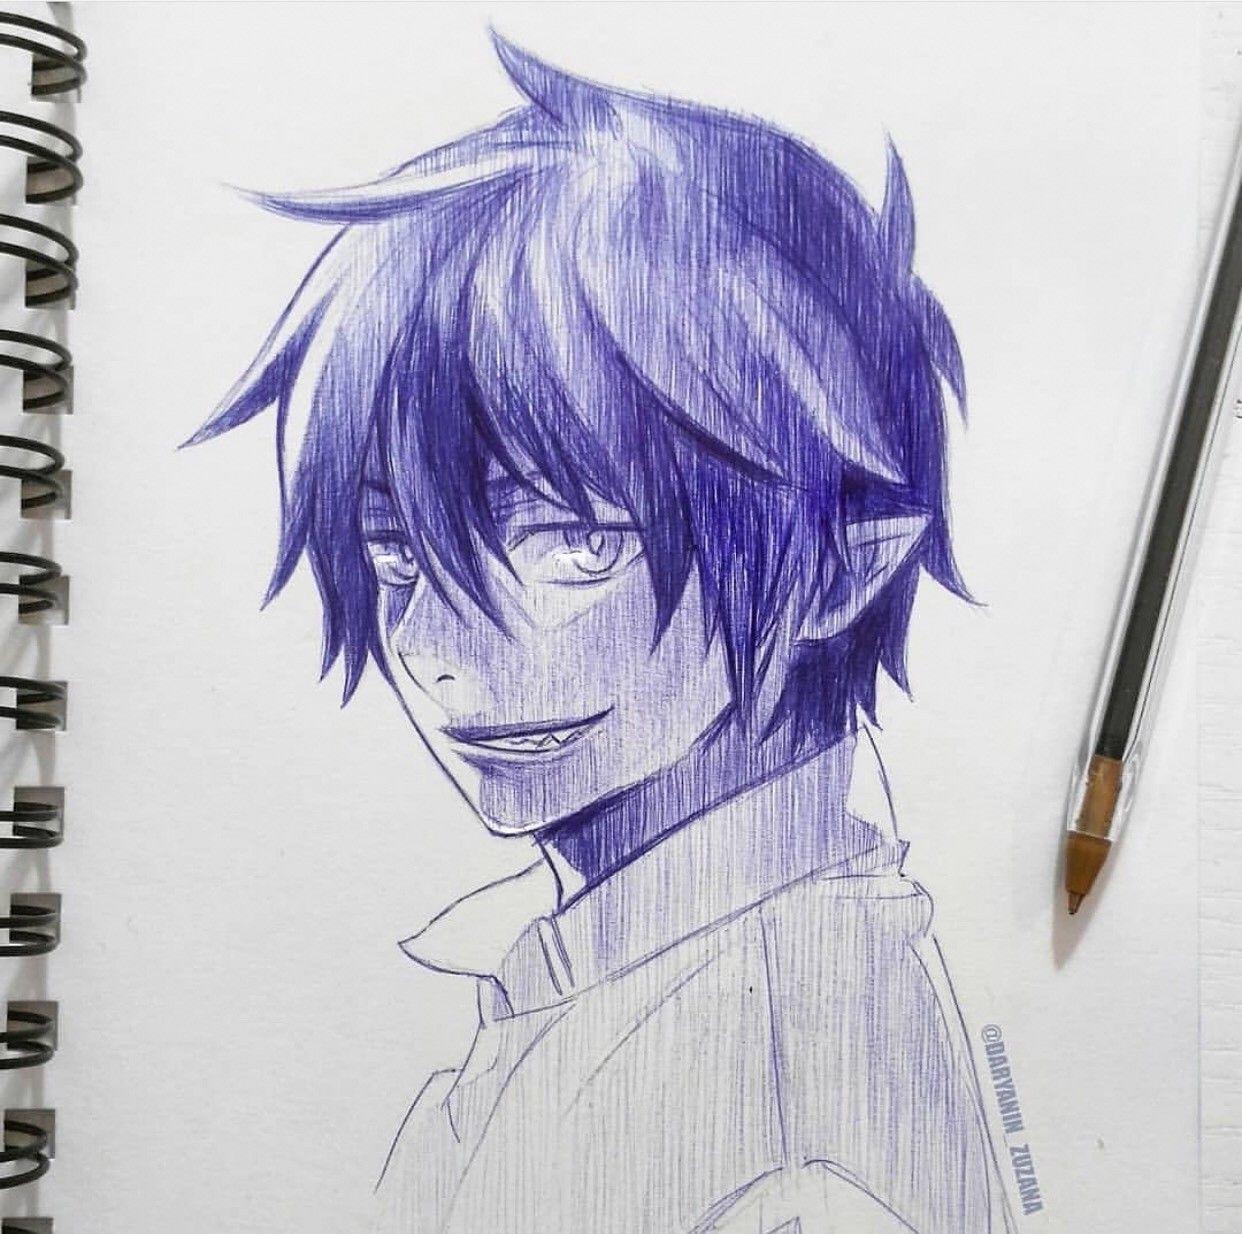 Rinokumura By Daryanin Zuzana Are You An Anime Artist Visit Your Second Home Animeignite Com Aonoexorcist Like Anime Art Anime Art